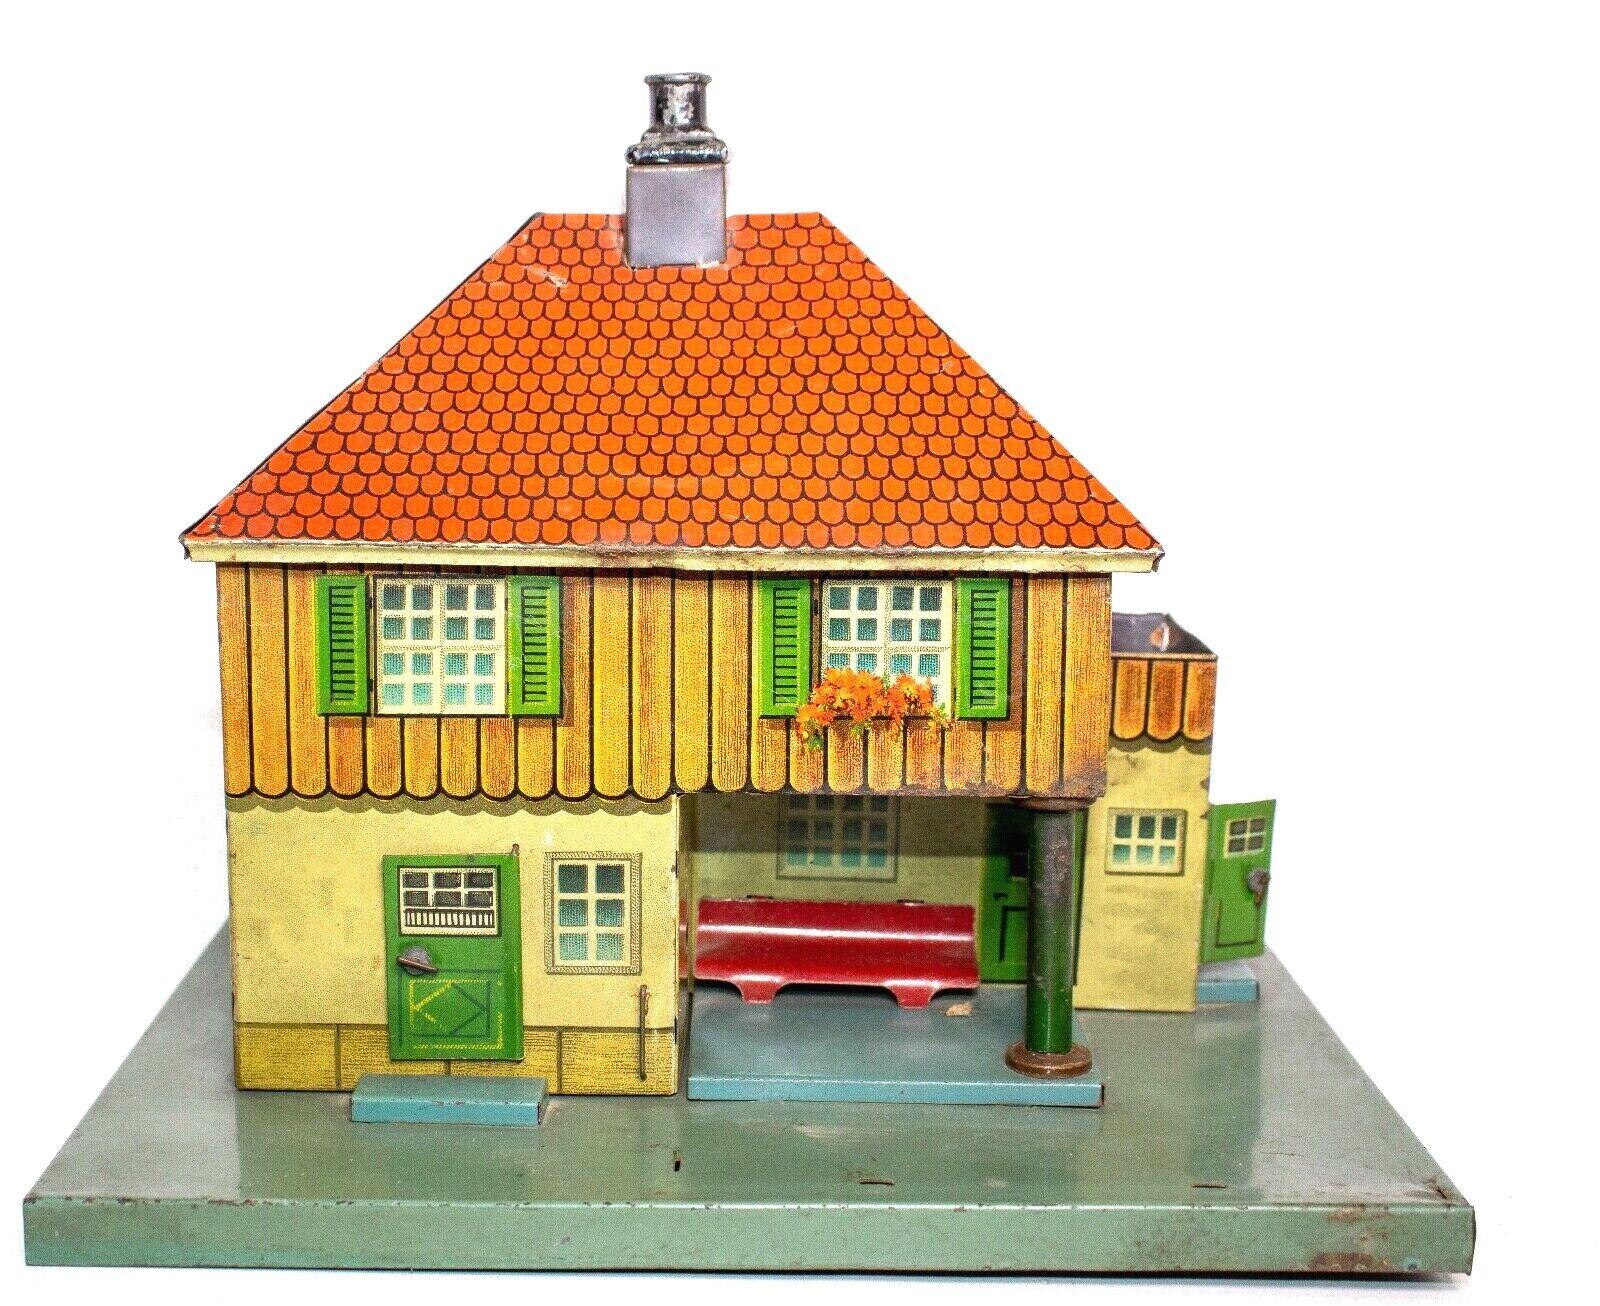 Jahr vor dem Krieg Bing 0-GAUGE Blech Litho 2-STORY Zug Station